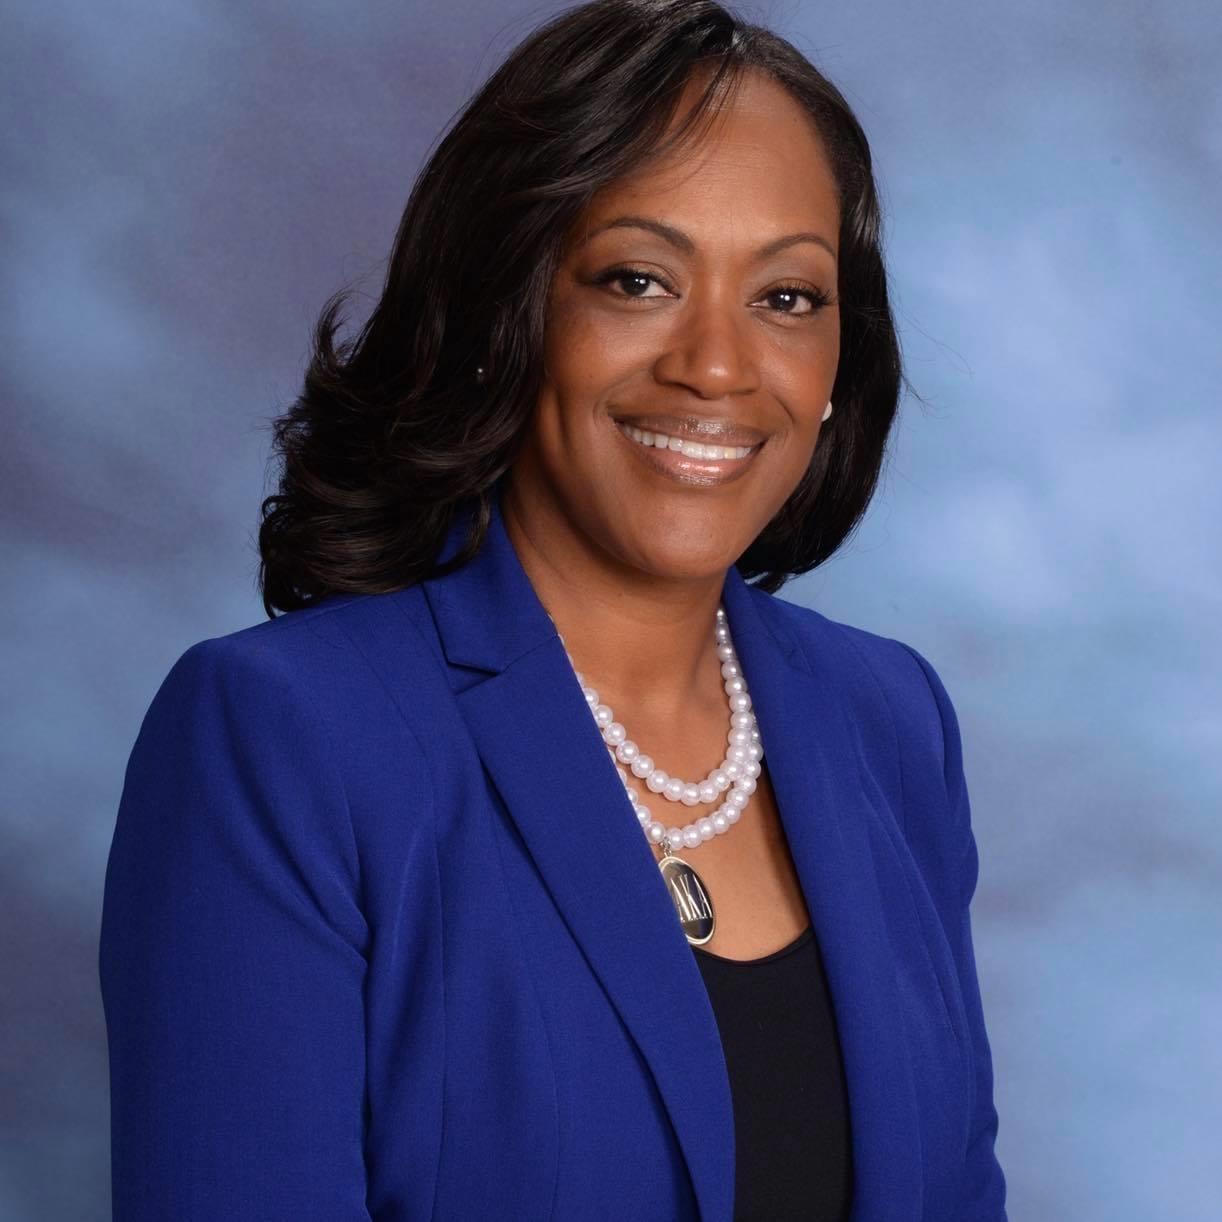 Photo of Dr. Catherine Edmonds